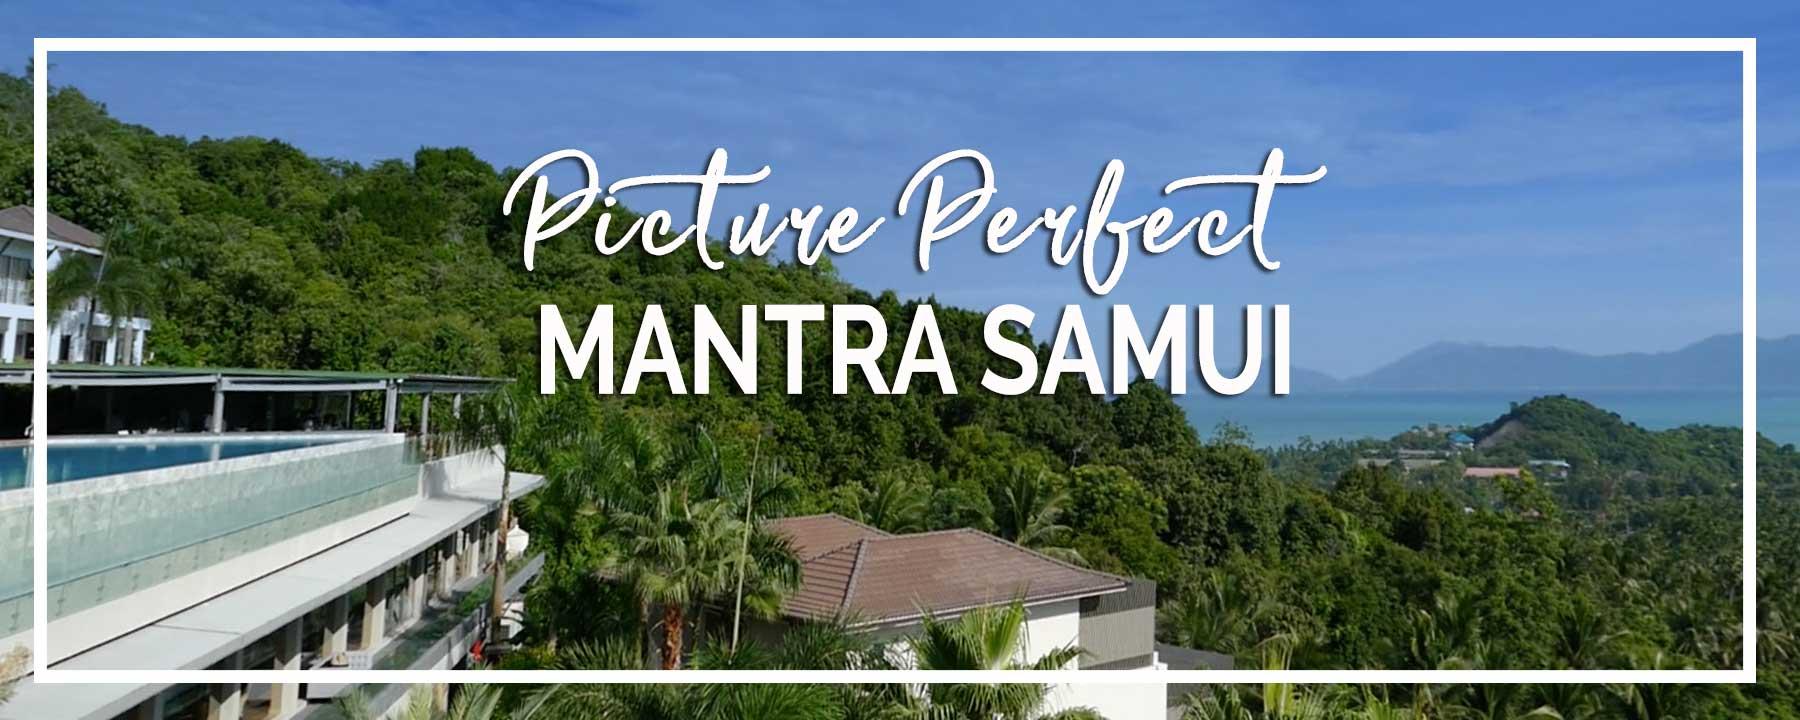 Koh Samui | Mantra Samui Resort with Breathtaking Island Views